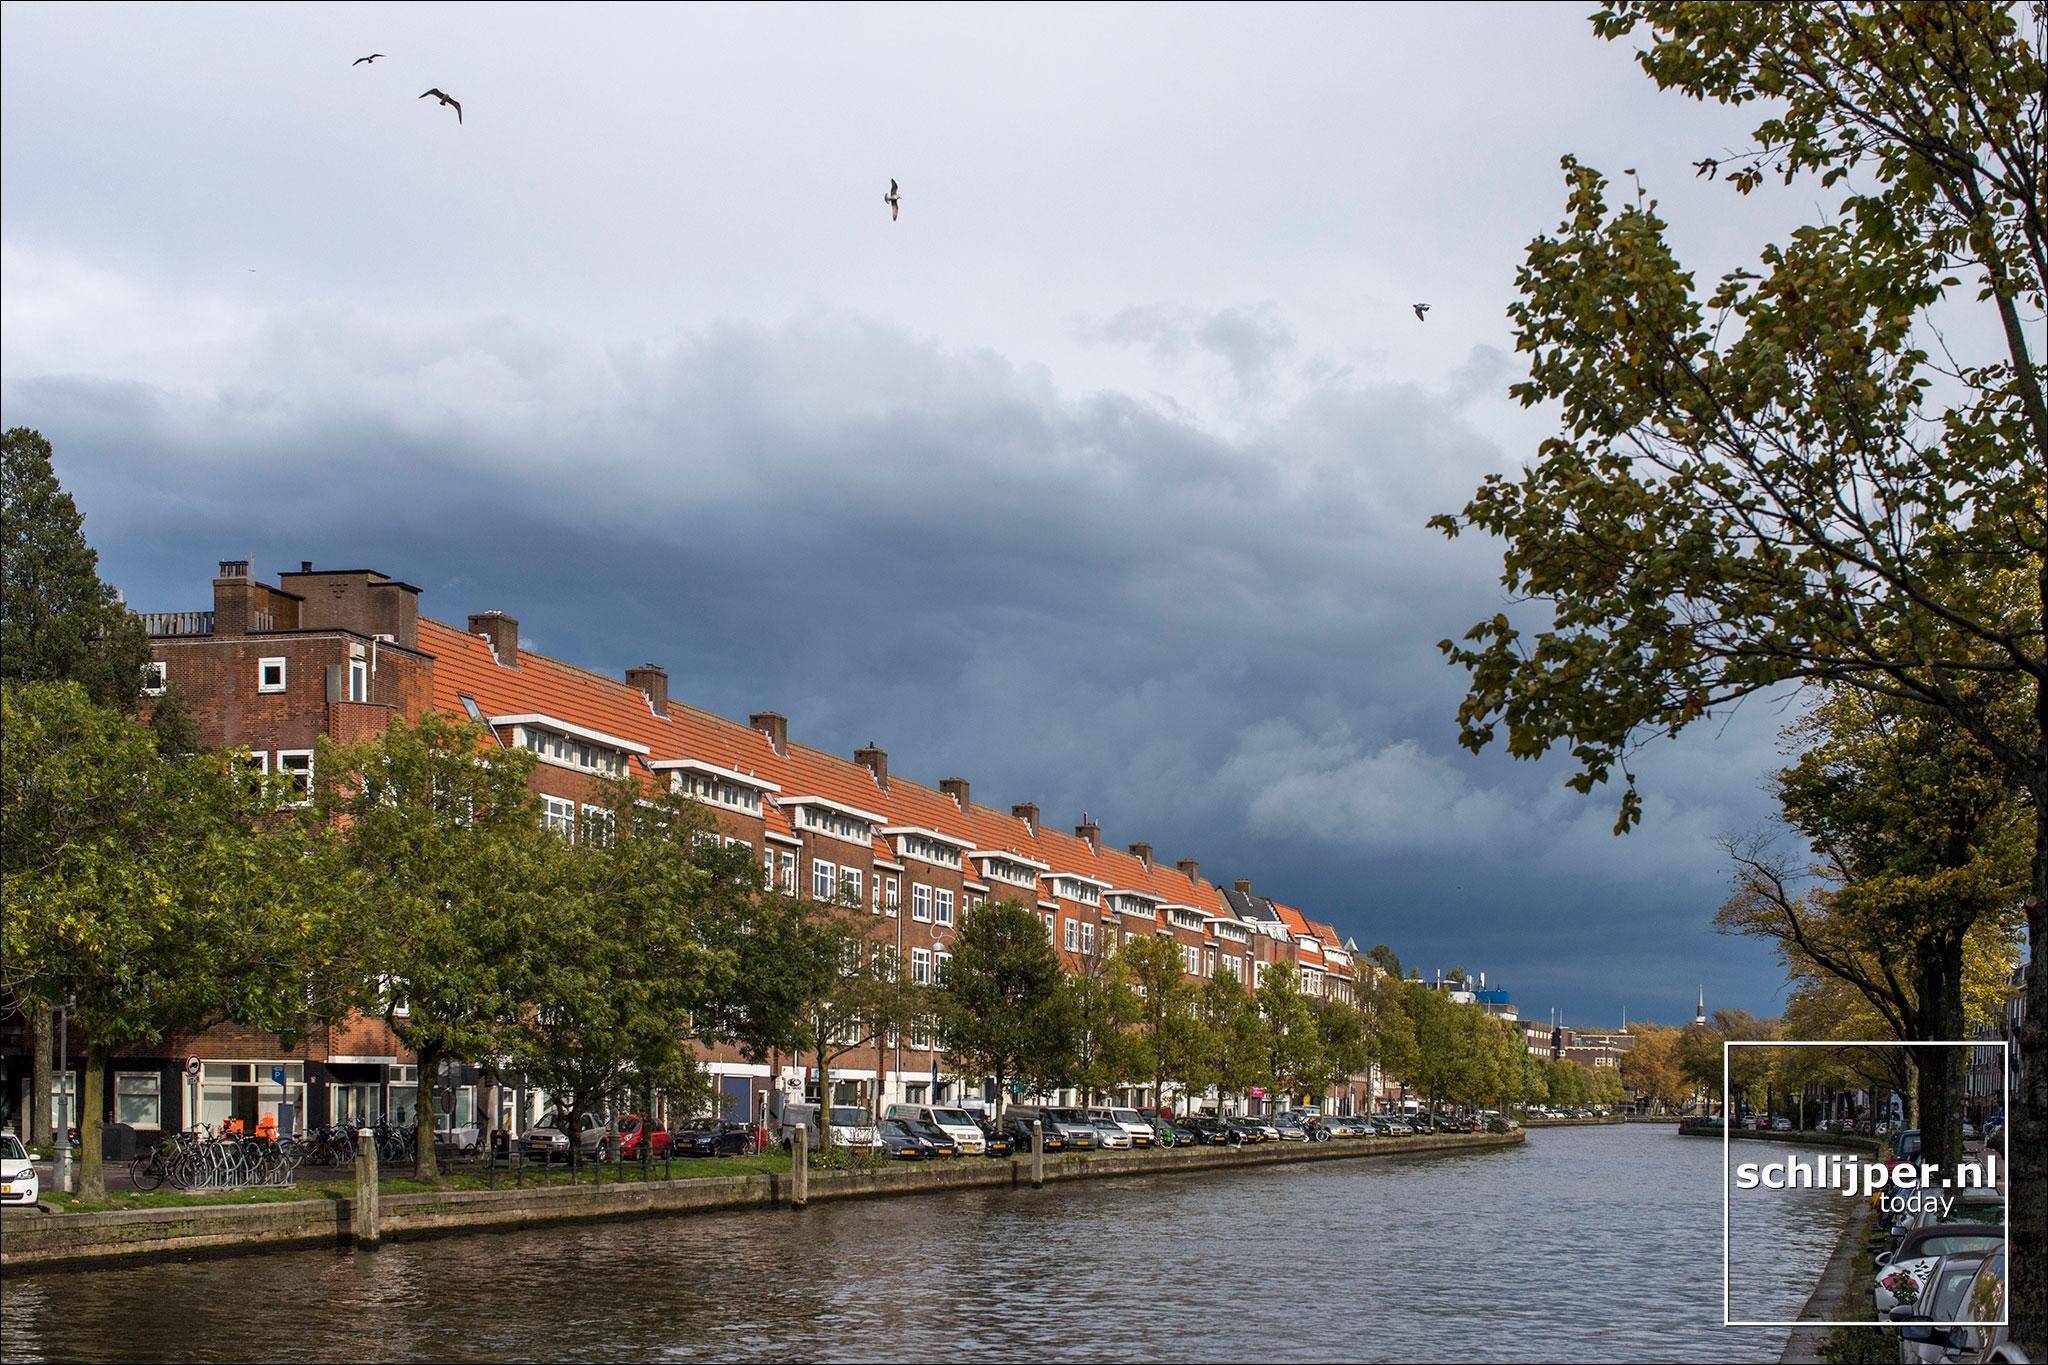 The Netherlands, Amsterdam, 18 oktober 2019